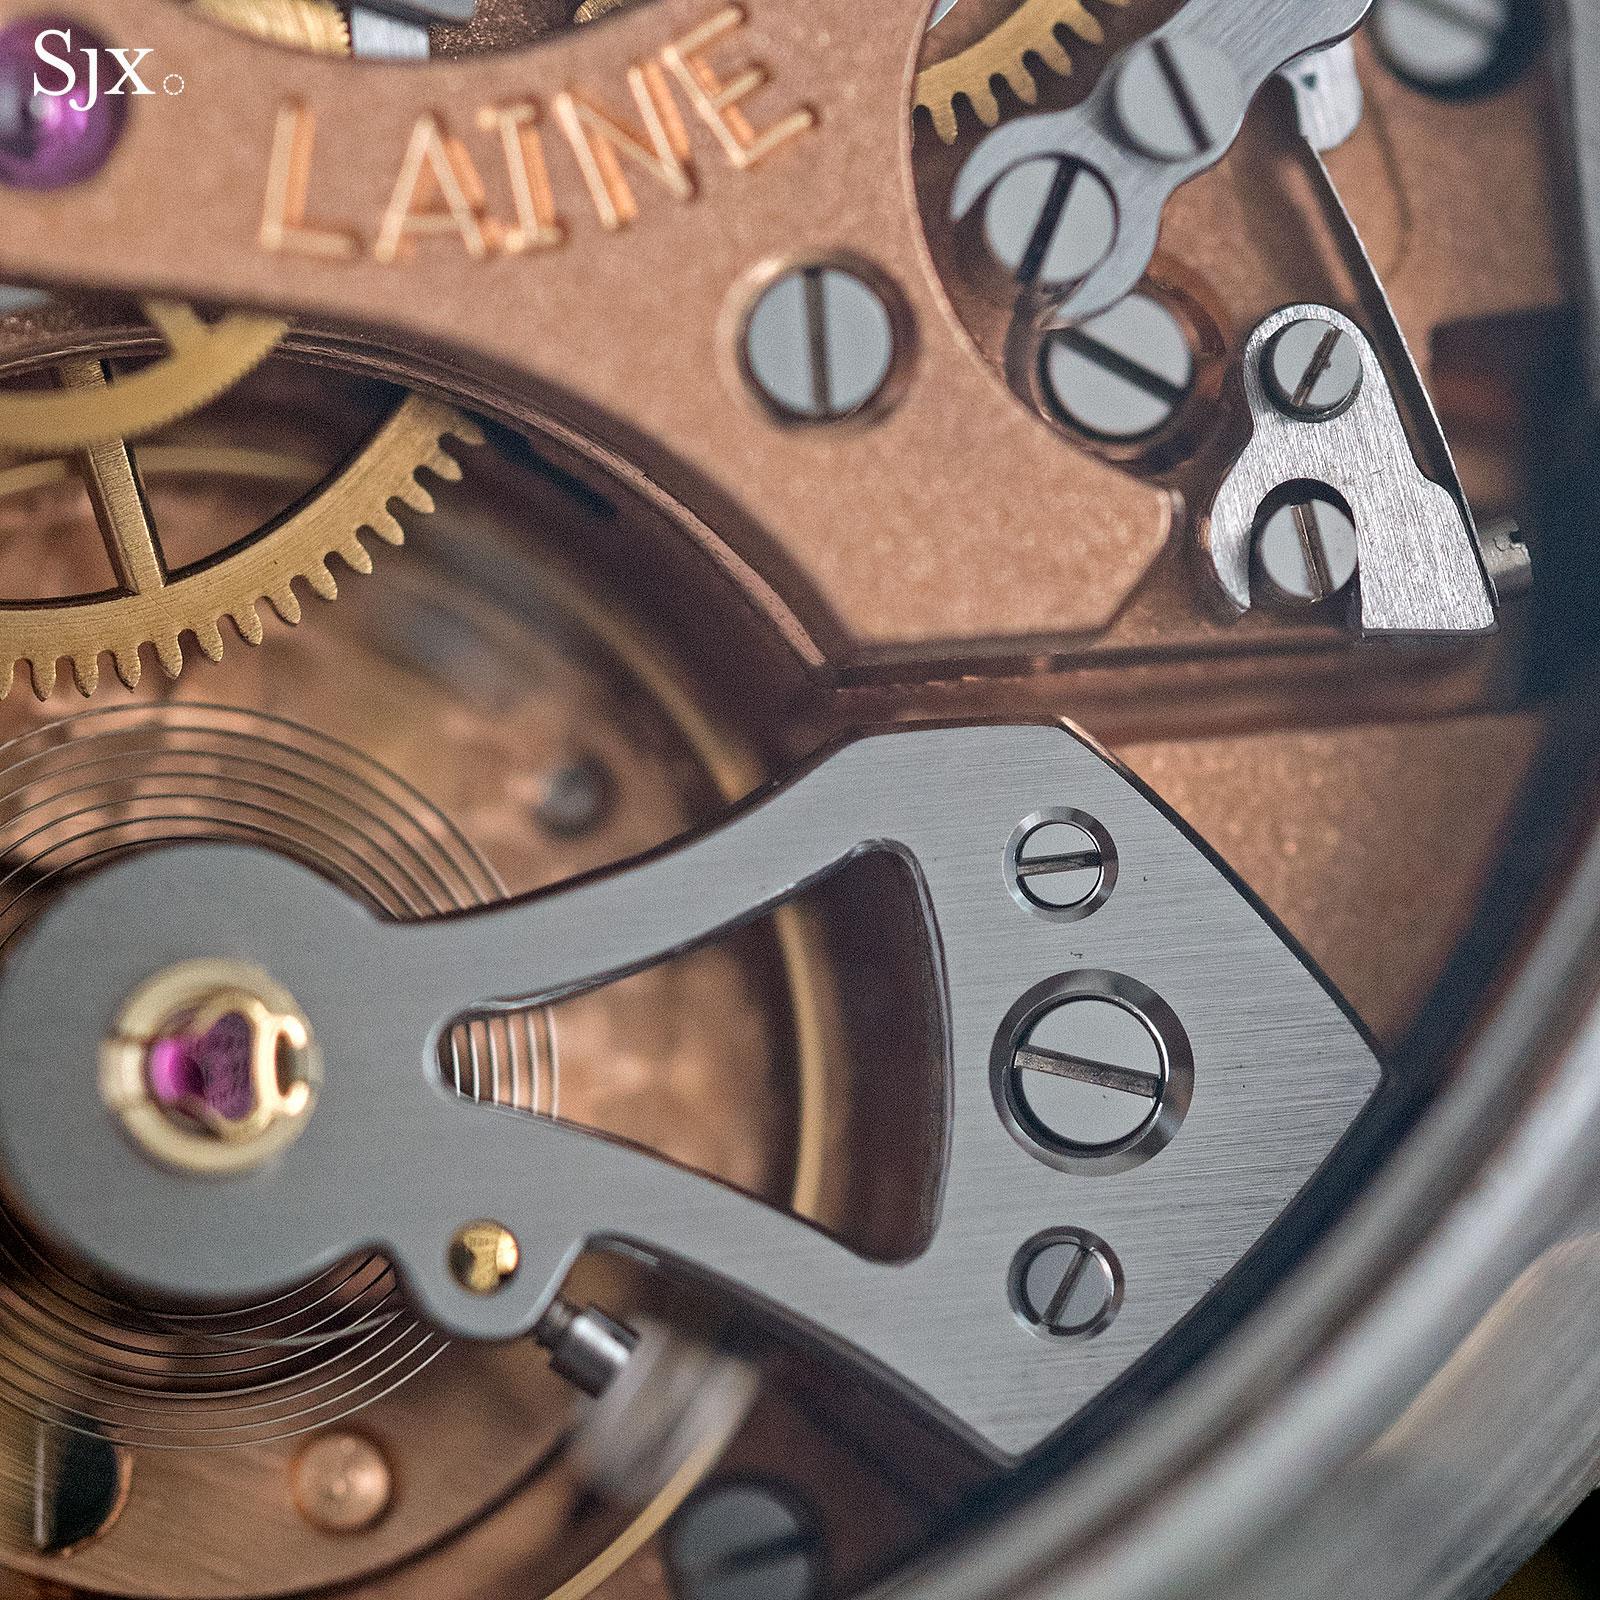 Laine Watches Chronograph Valjoux 22 - 10